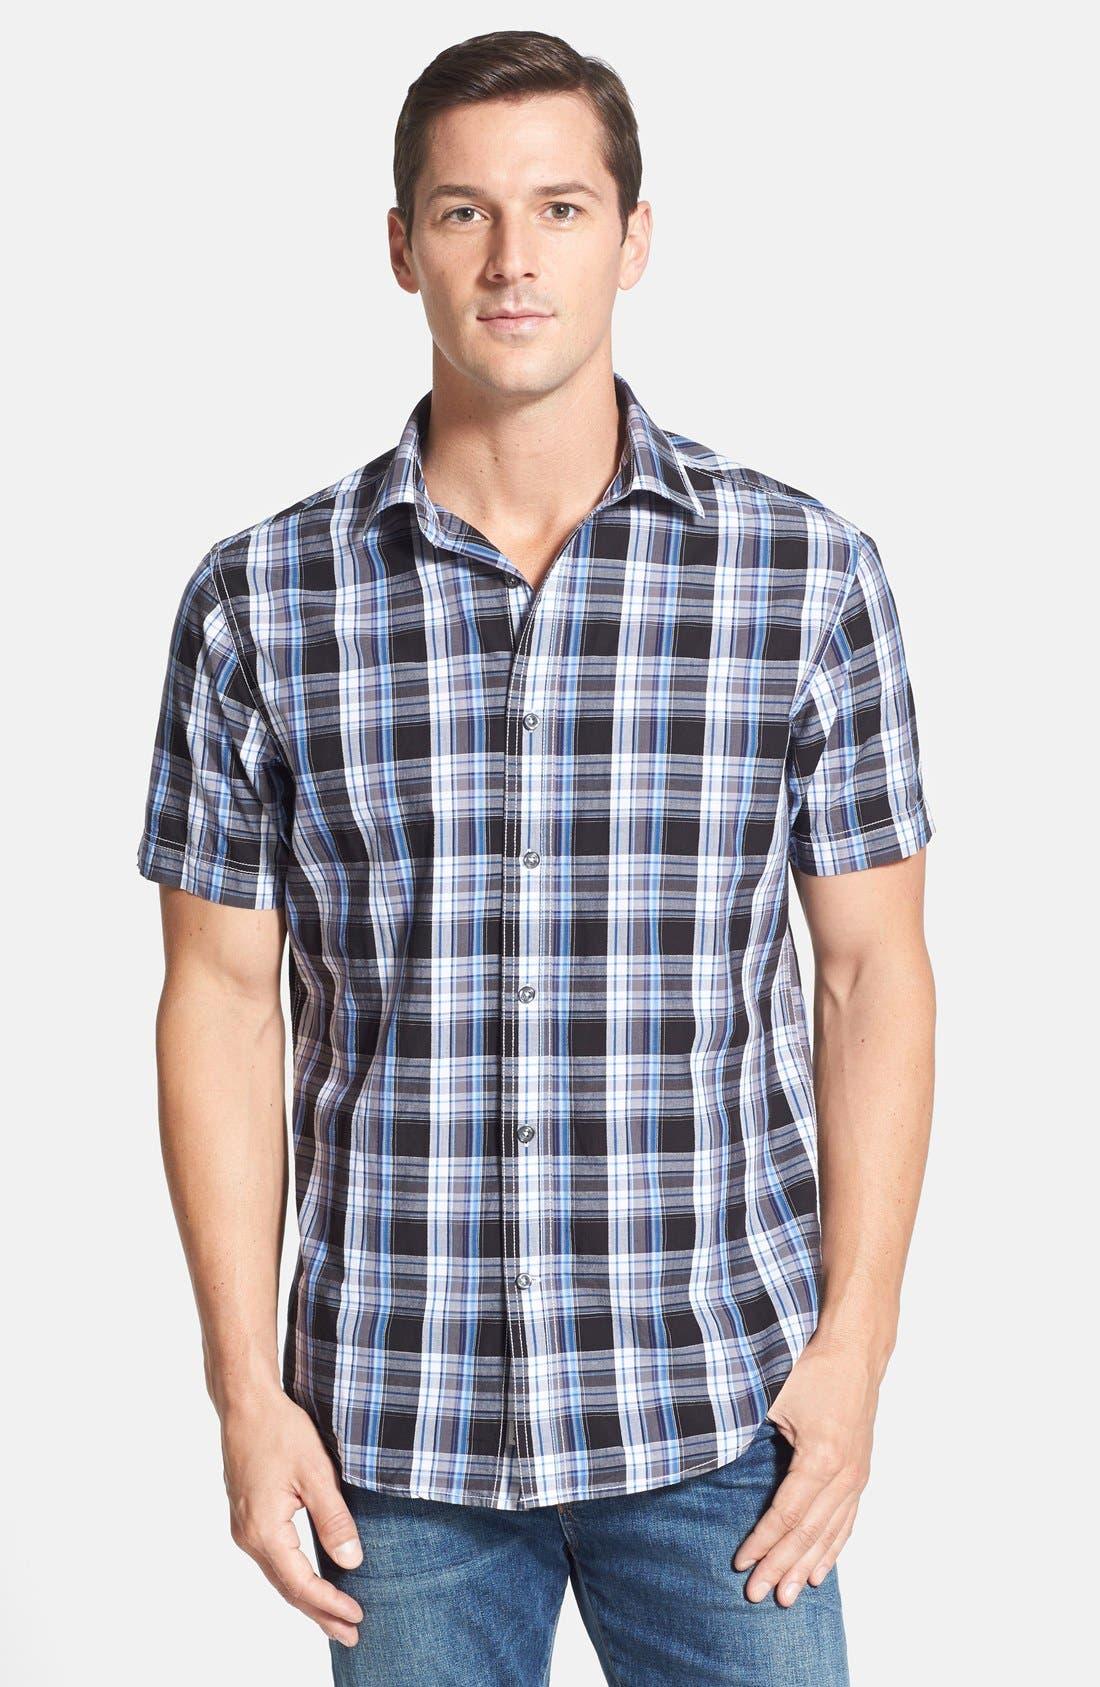 Alternate Image 1 Selected - James Campbell 'Monitiel Plaid' Short Sleeve Sport Shirt